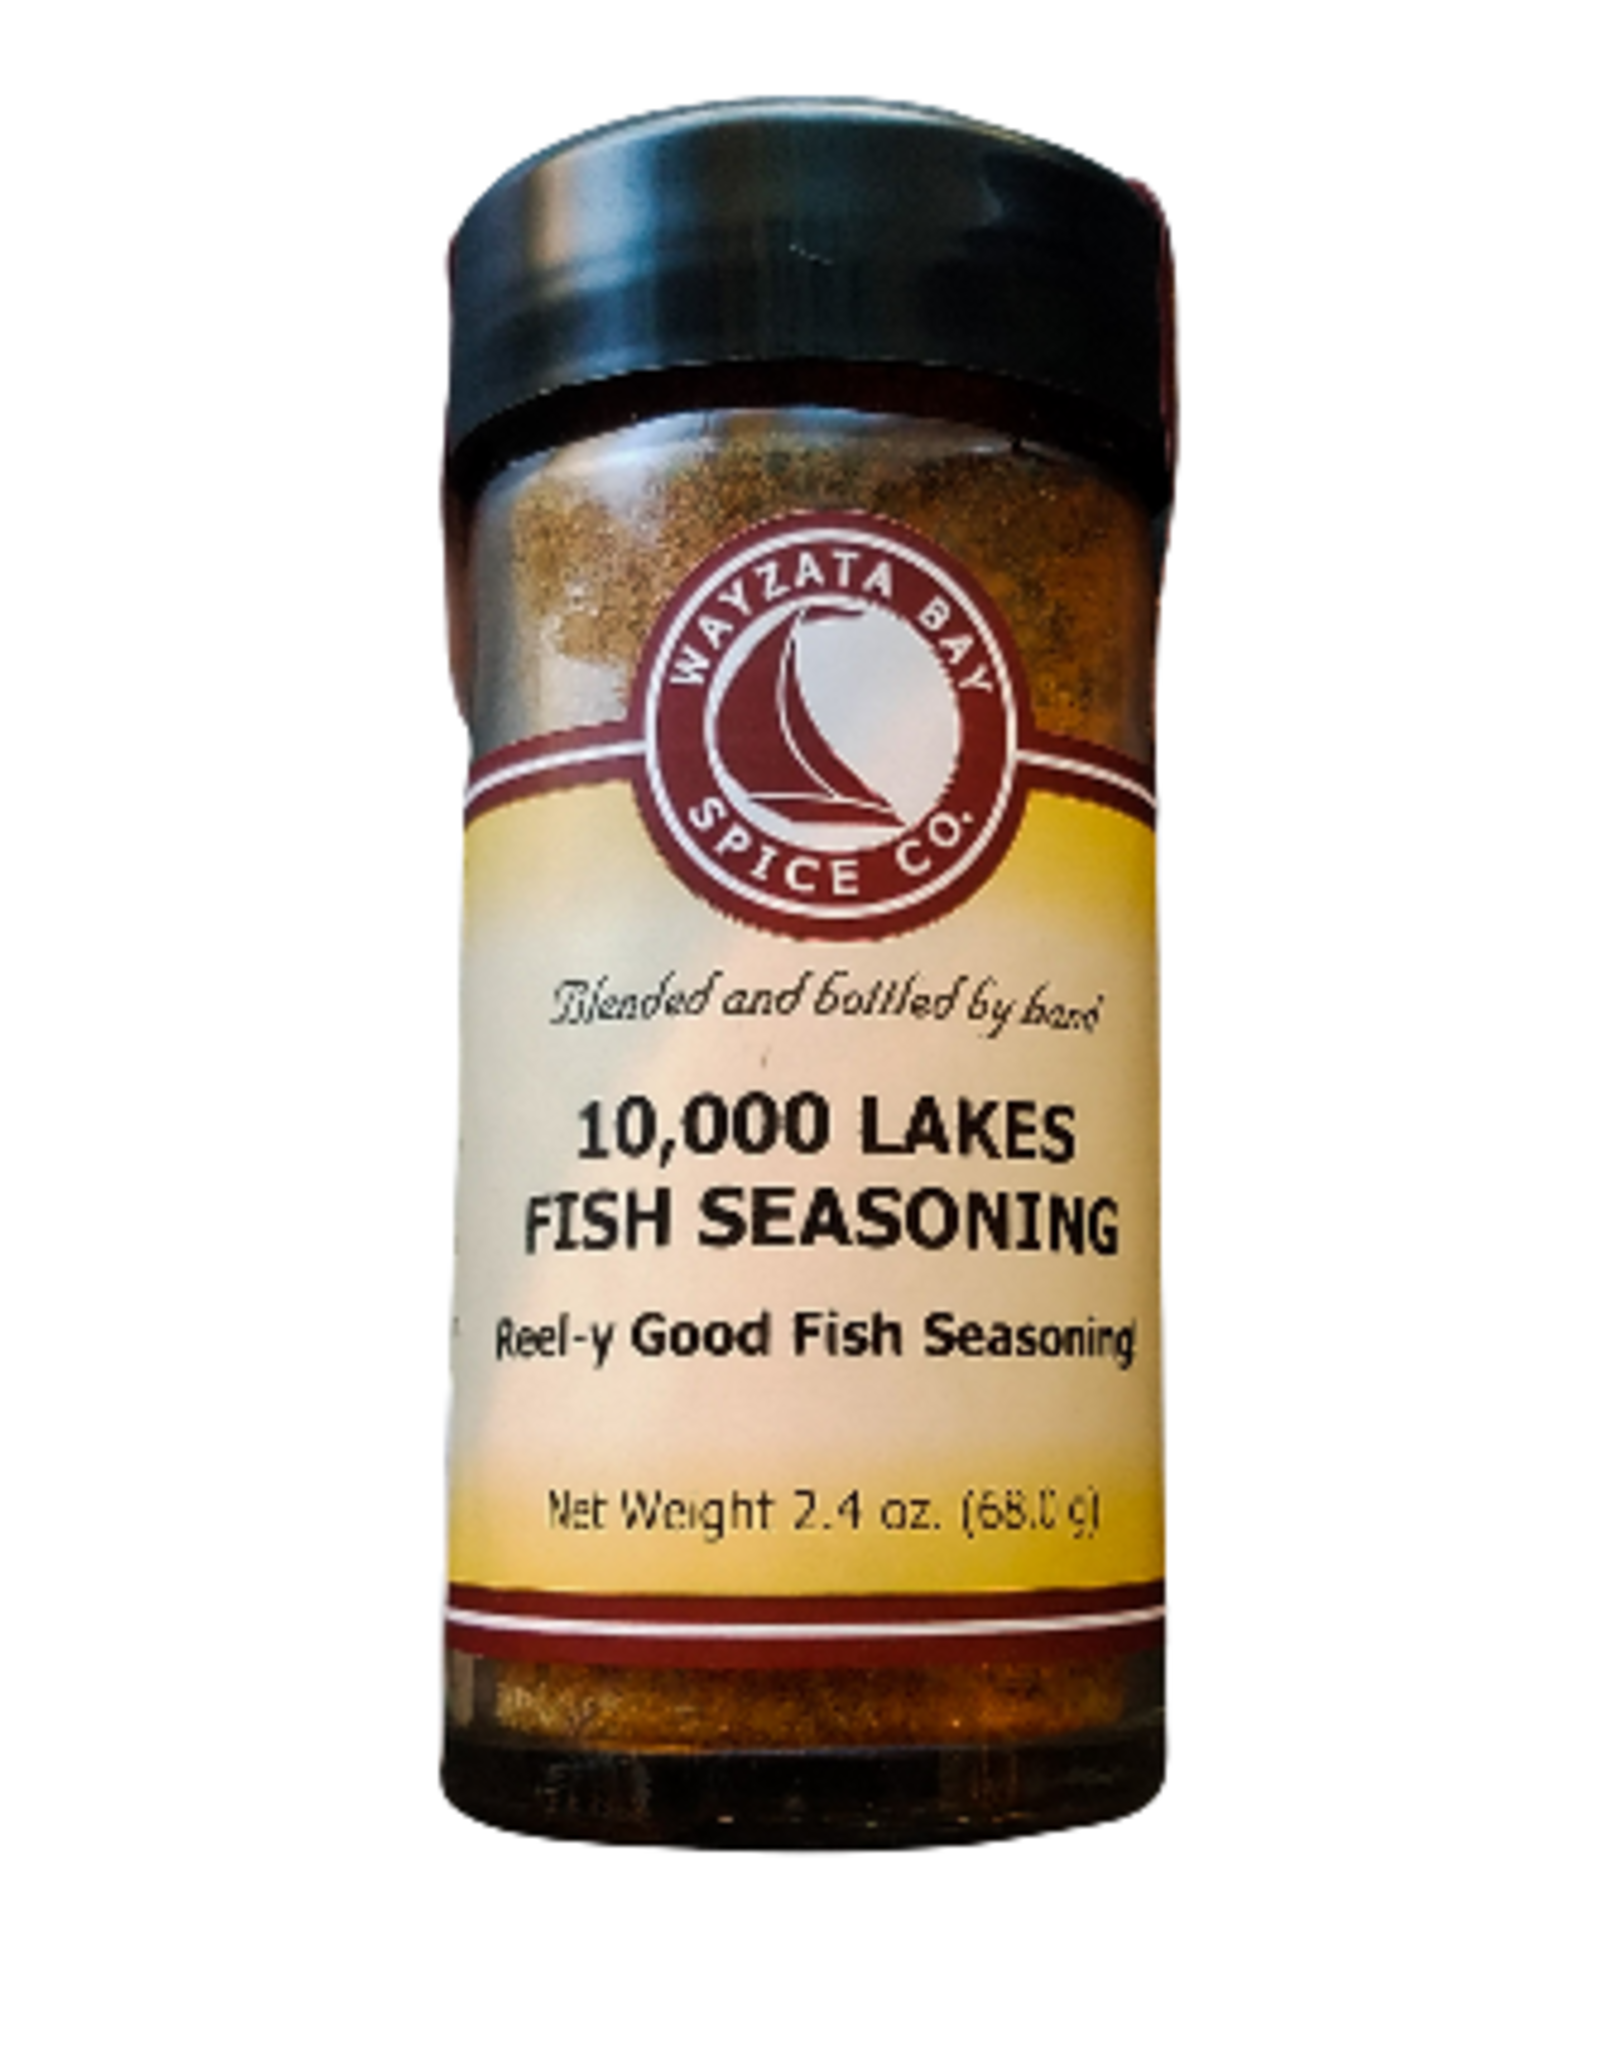 Wayzata Bay Spice Co. 10,000 Lakes Fish Seasoning